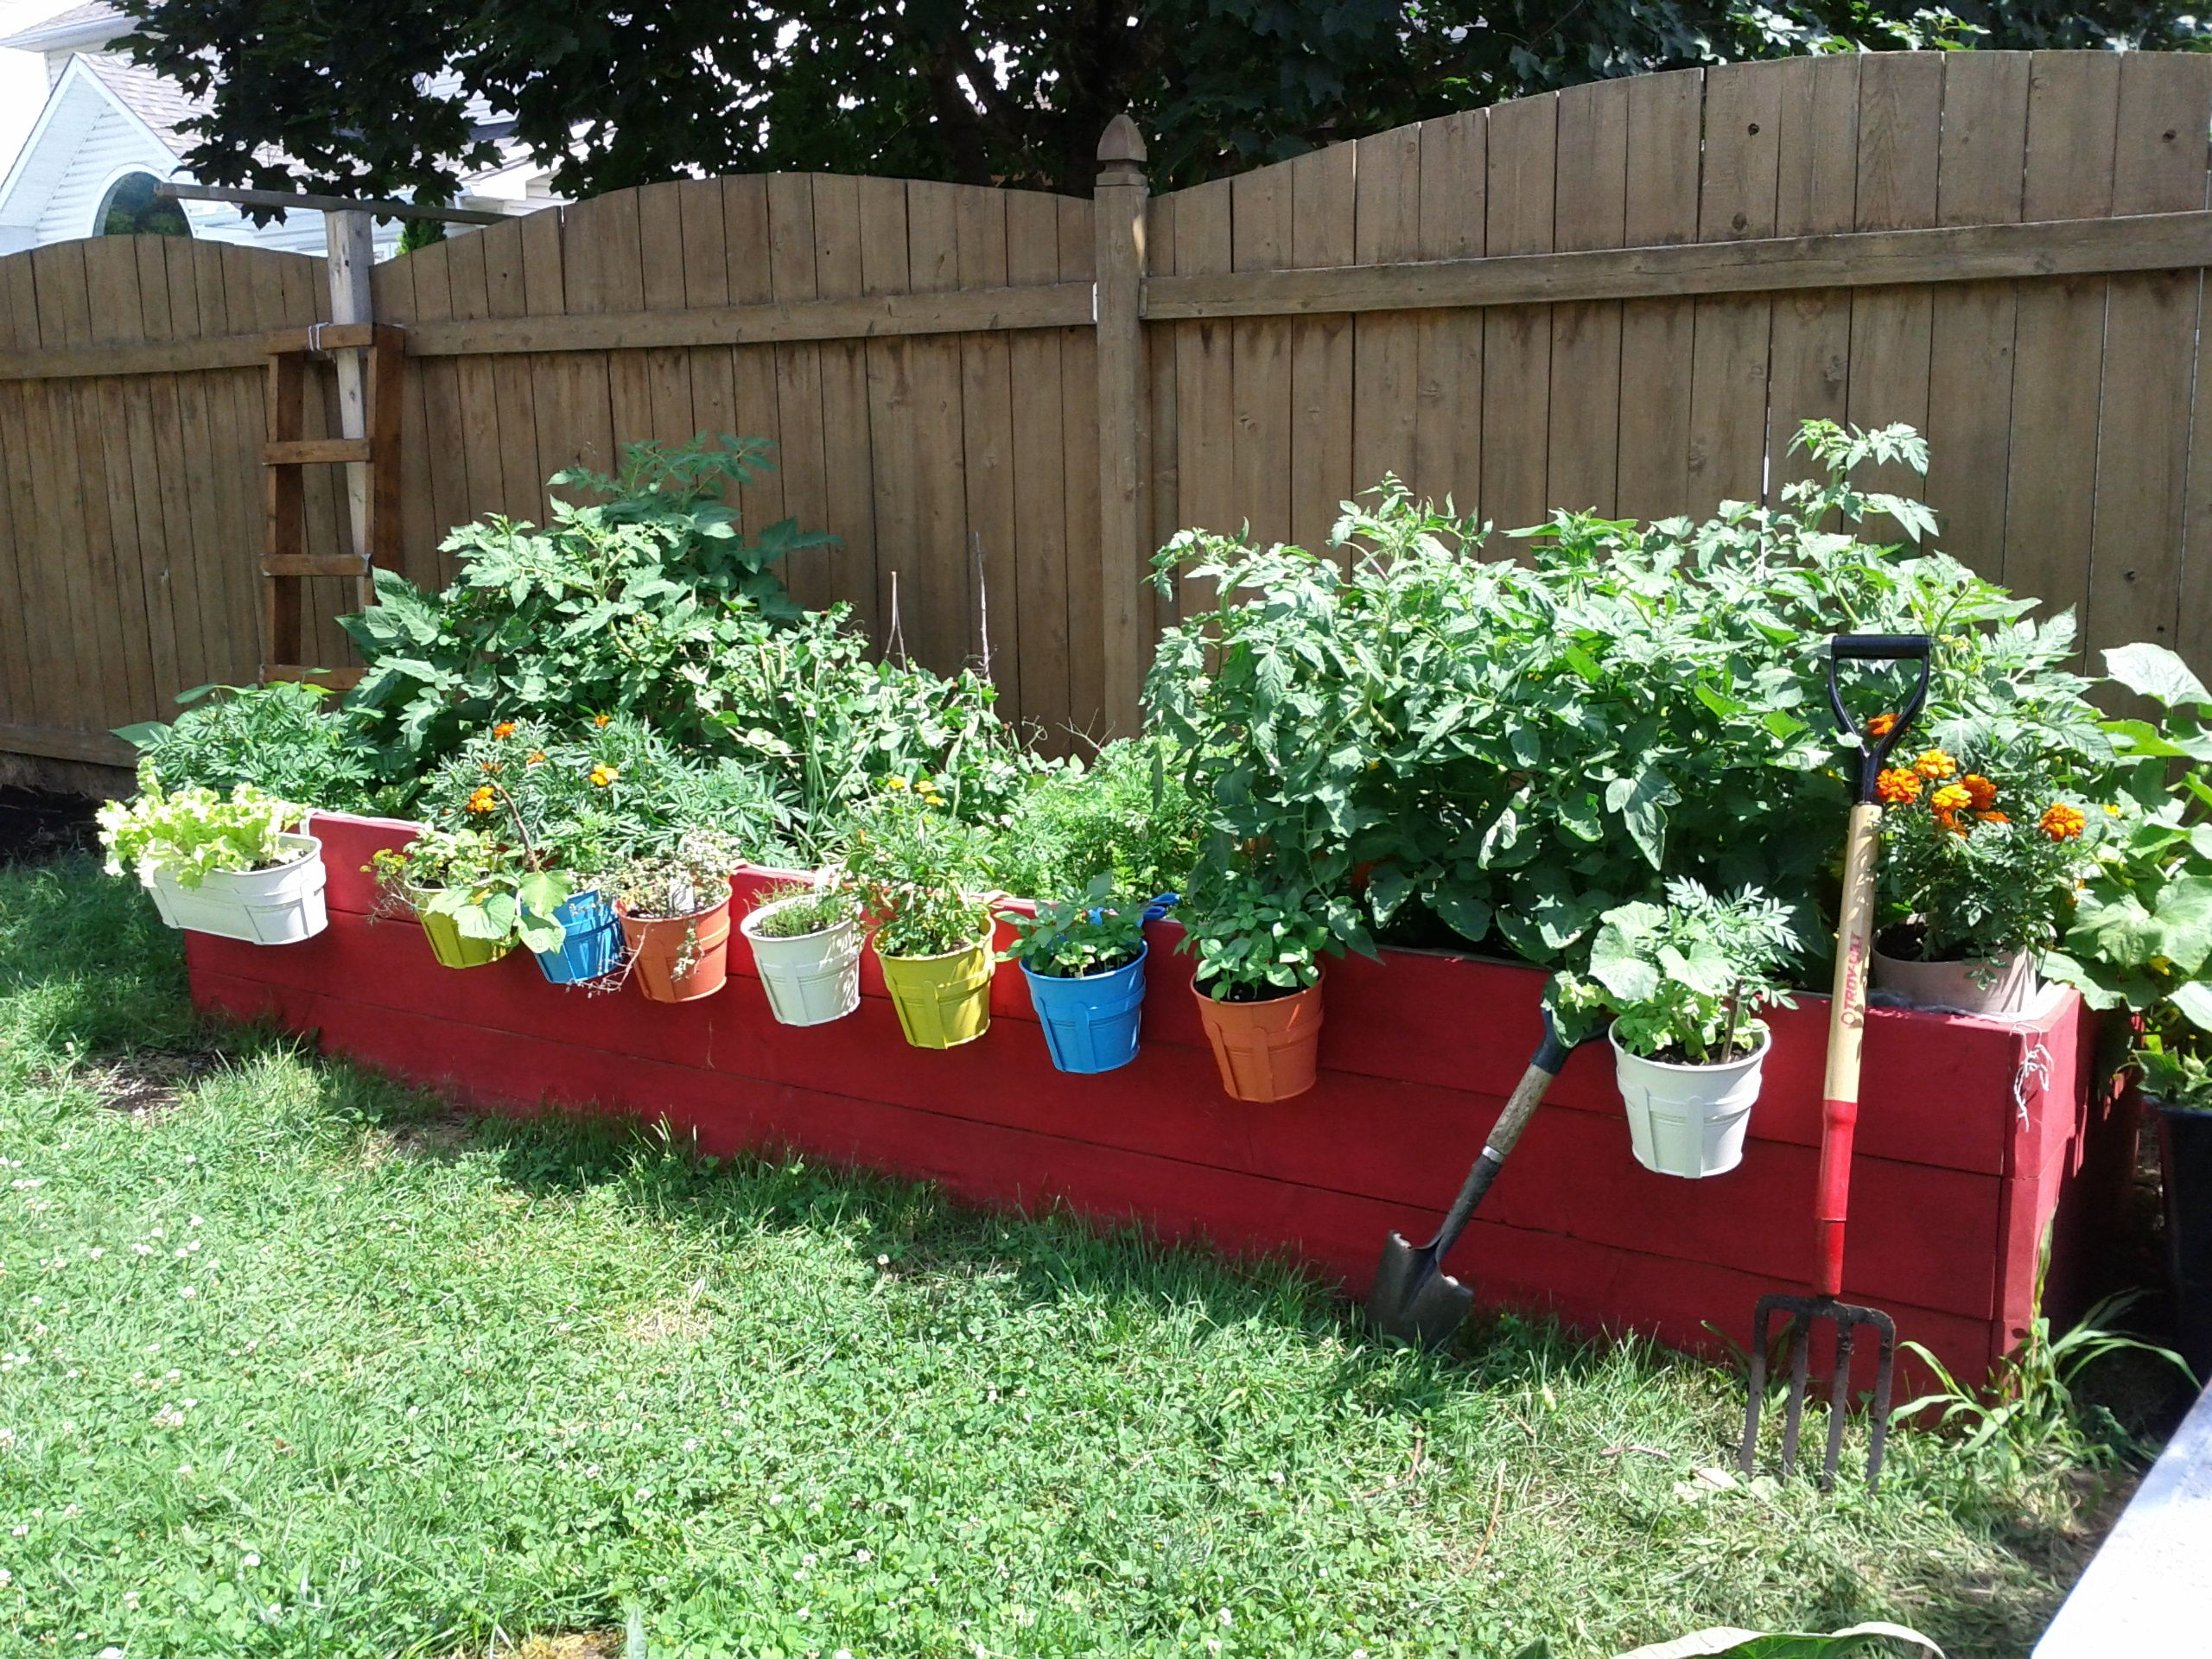 Pin by Anna Lundeen on Gardening Ideas  Raised garden beds